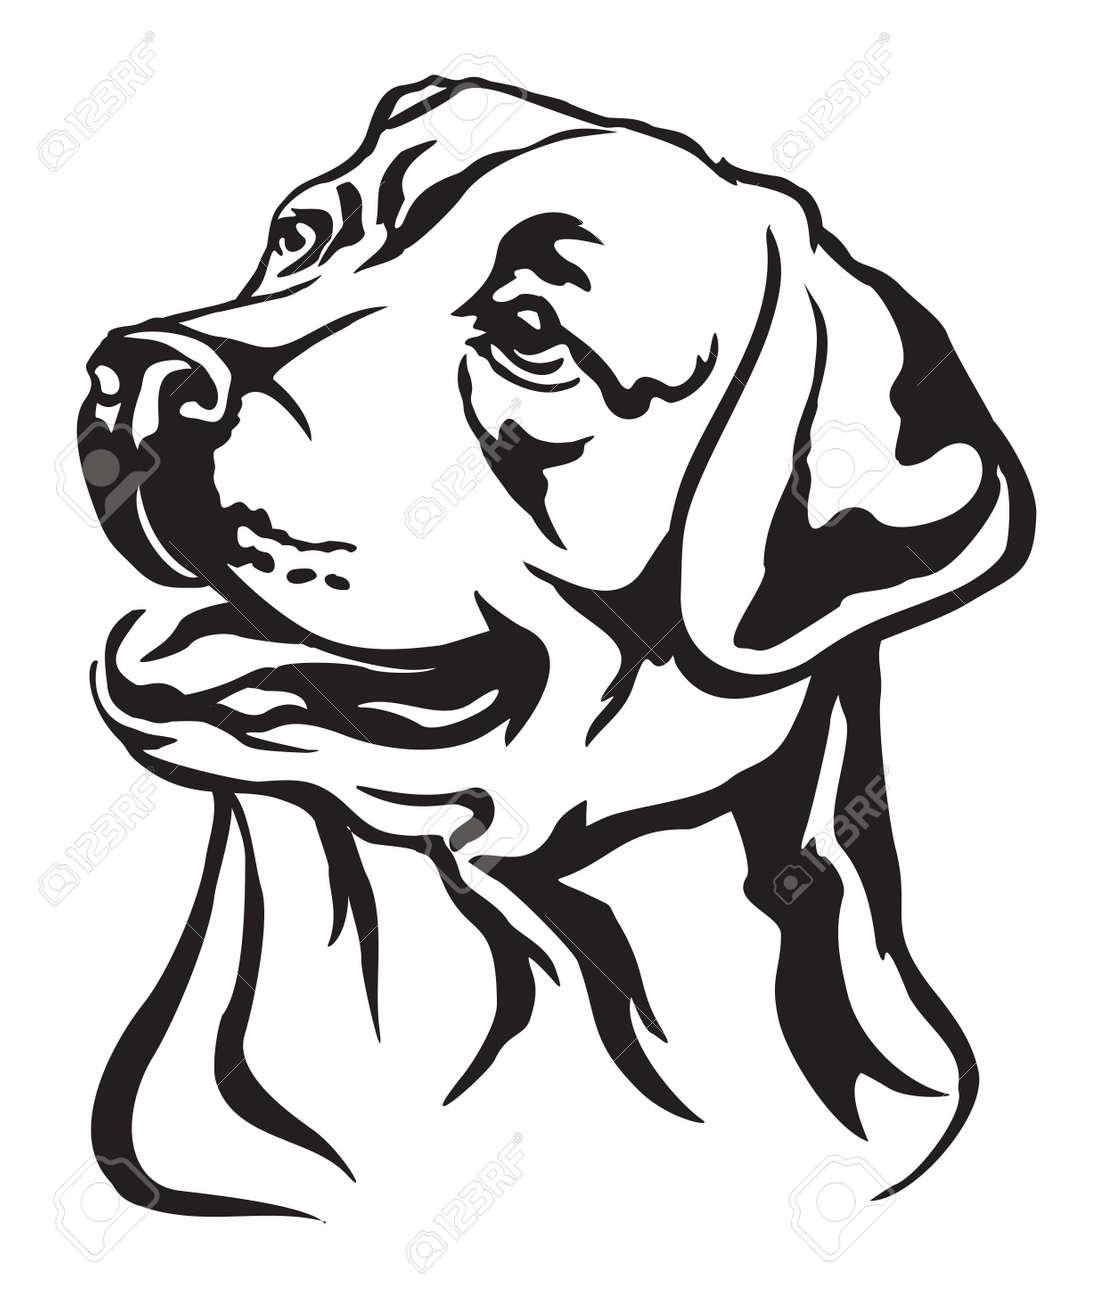 Black Dog Stock Illustrations Cliparts And Royalty Free Black Dog